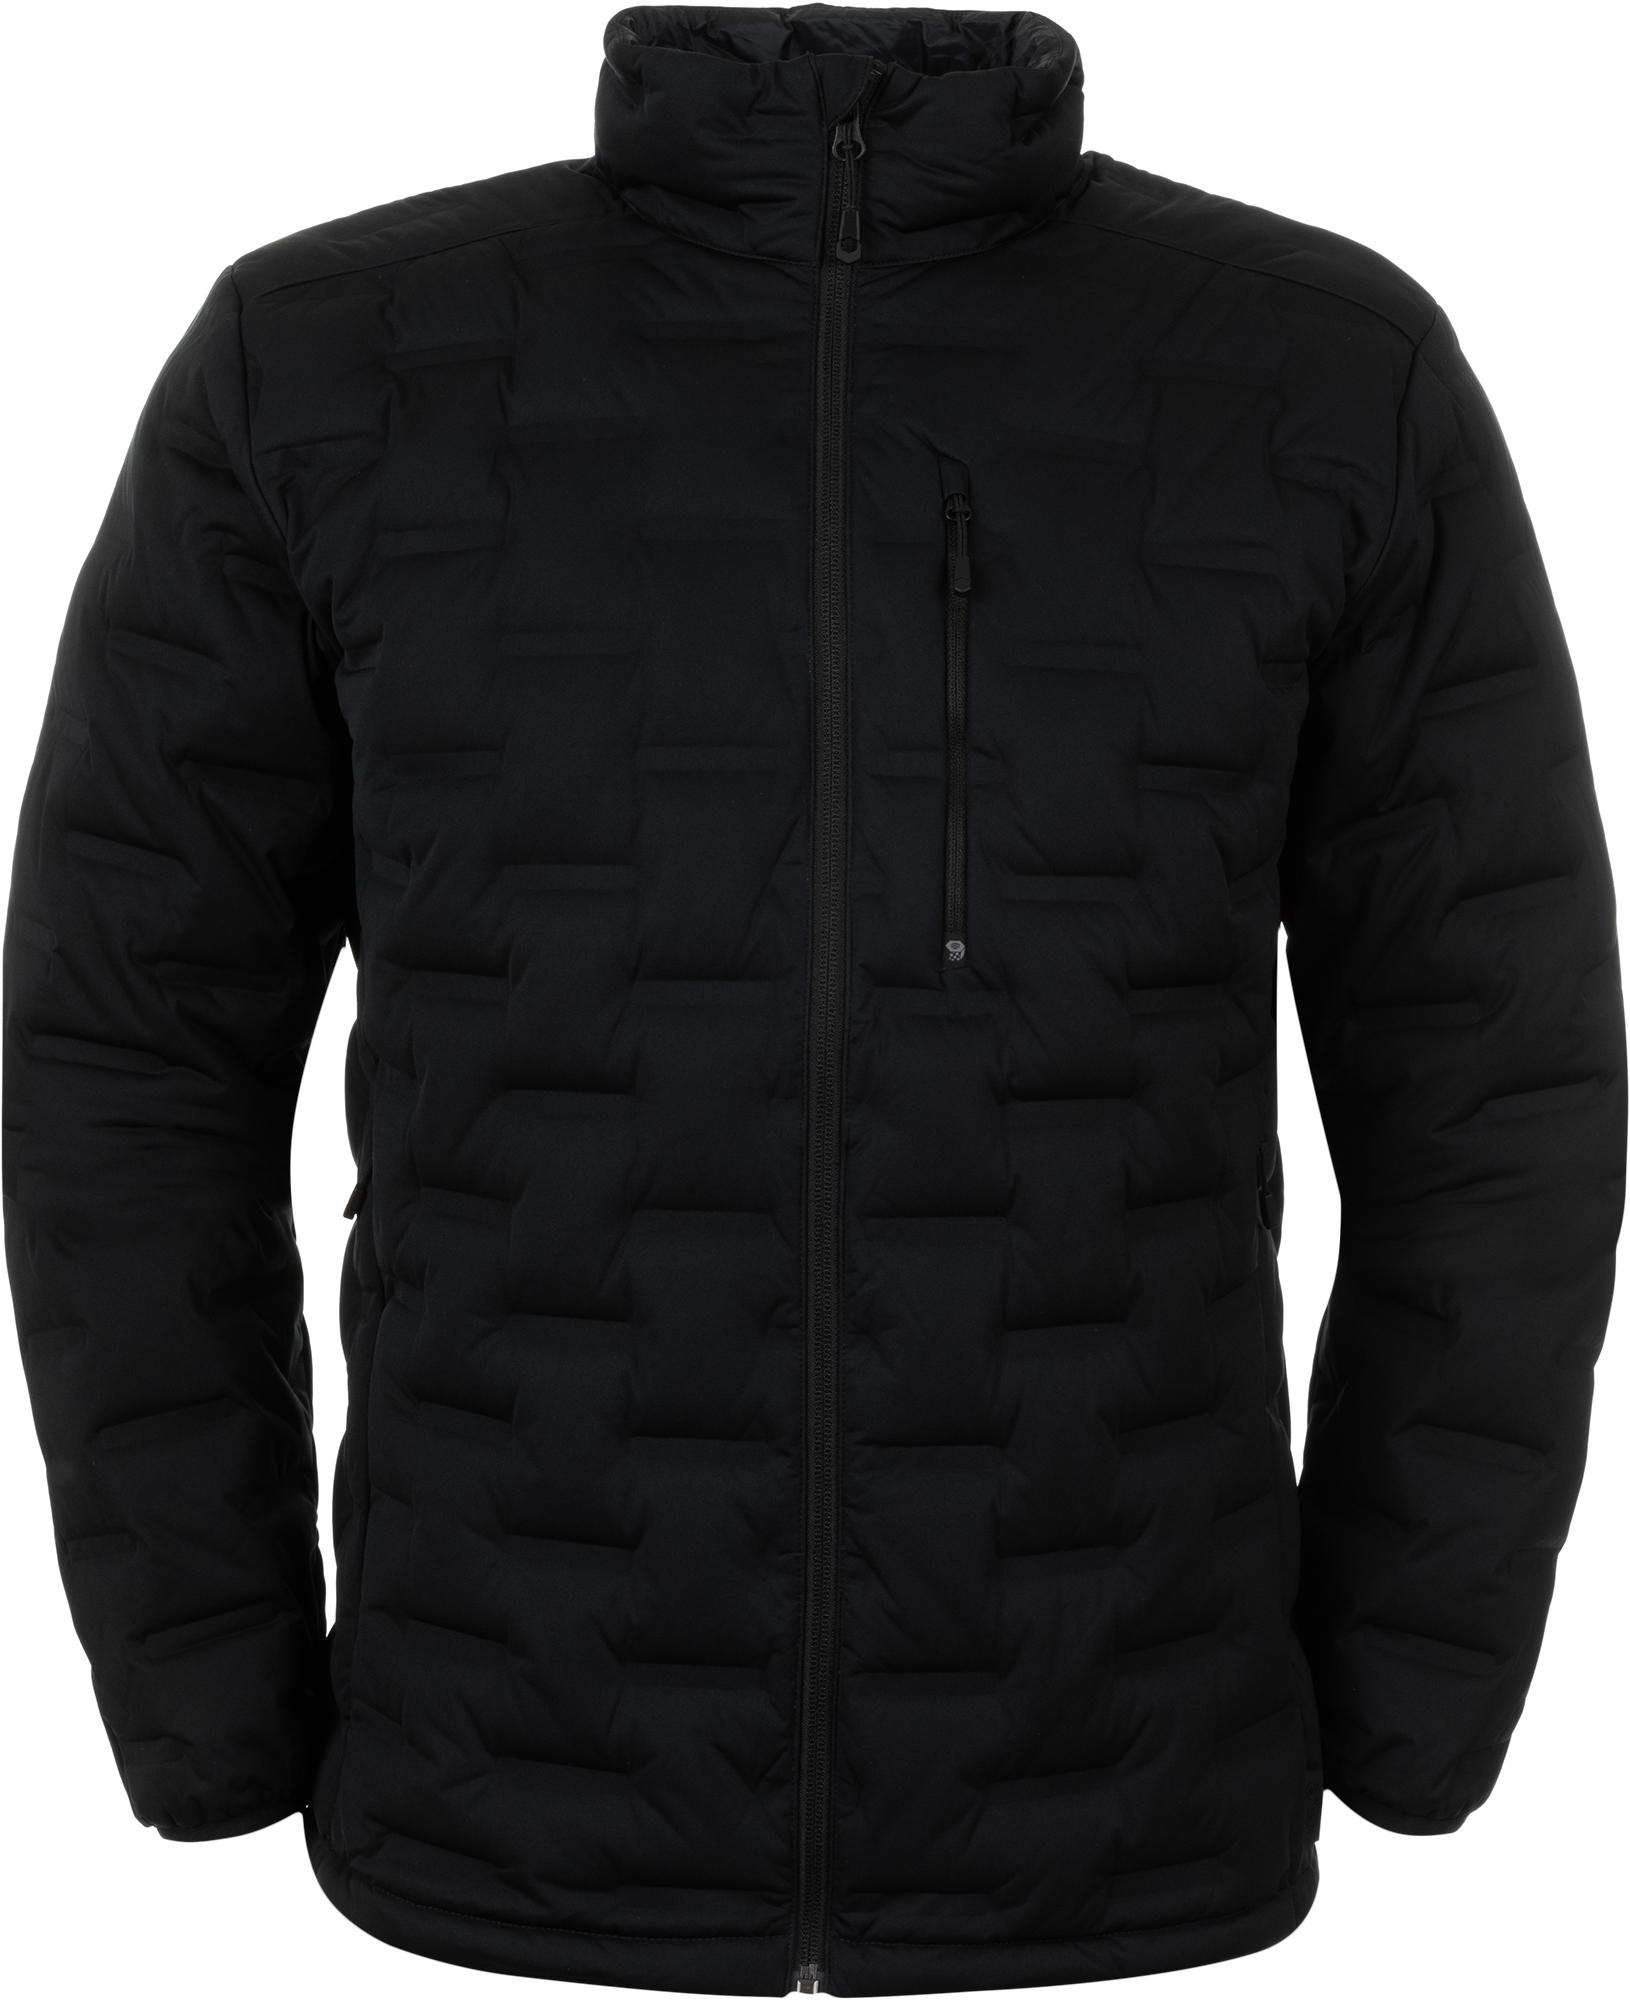 Mountain Hardwear Куртка пуховая мужская Mountain Hardwear Stretchdown DS, размер 52